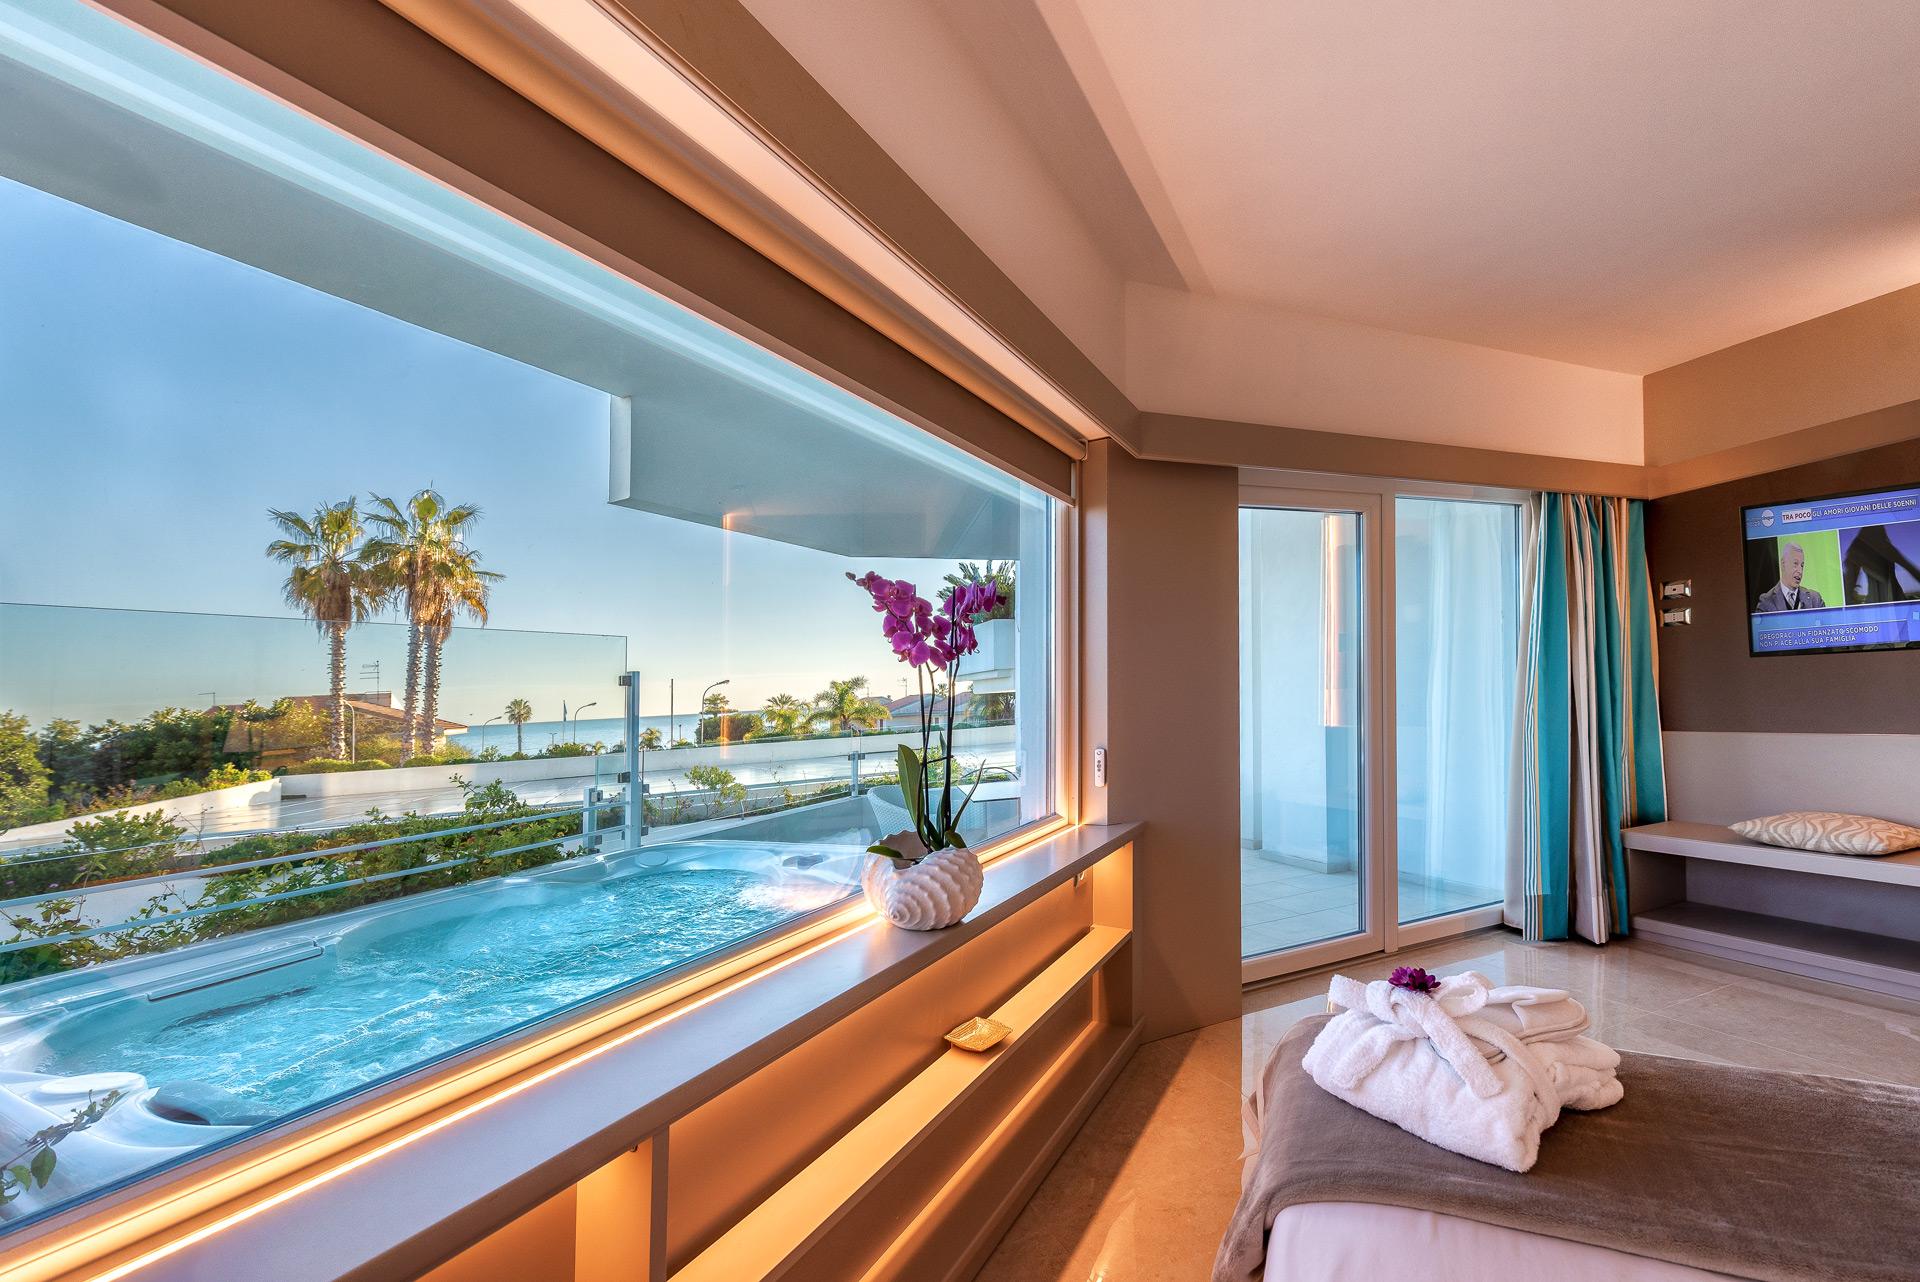 Hotel Marina di Ragusa - Acacia Palace - Suite con Jacuzzi